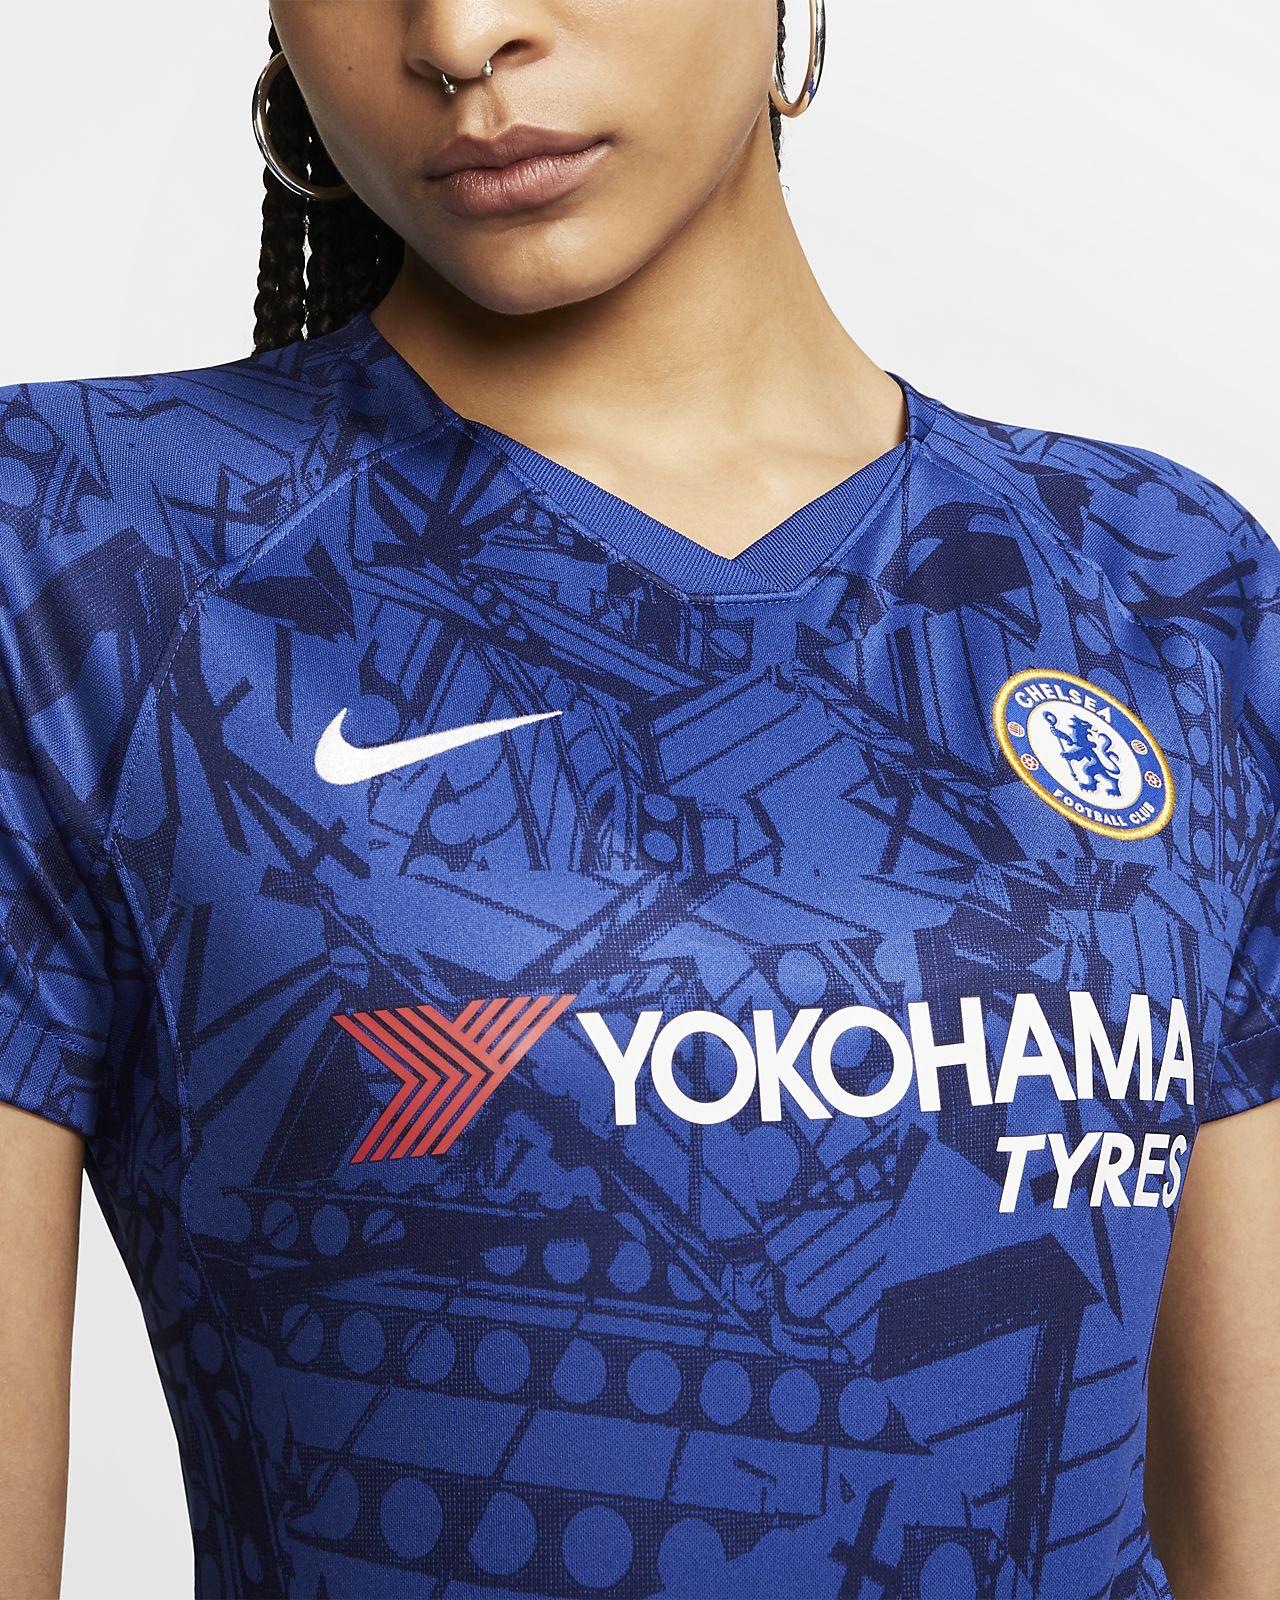 add430730 Chelsea FC 2019 20 Stadium Home Women s Soccer Jersey. Nike.com